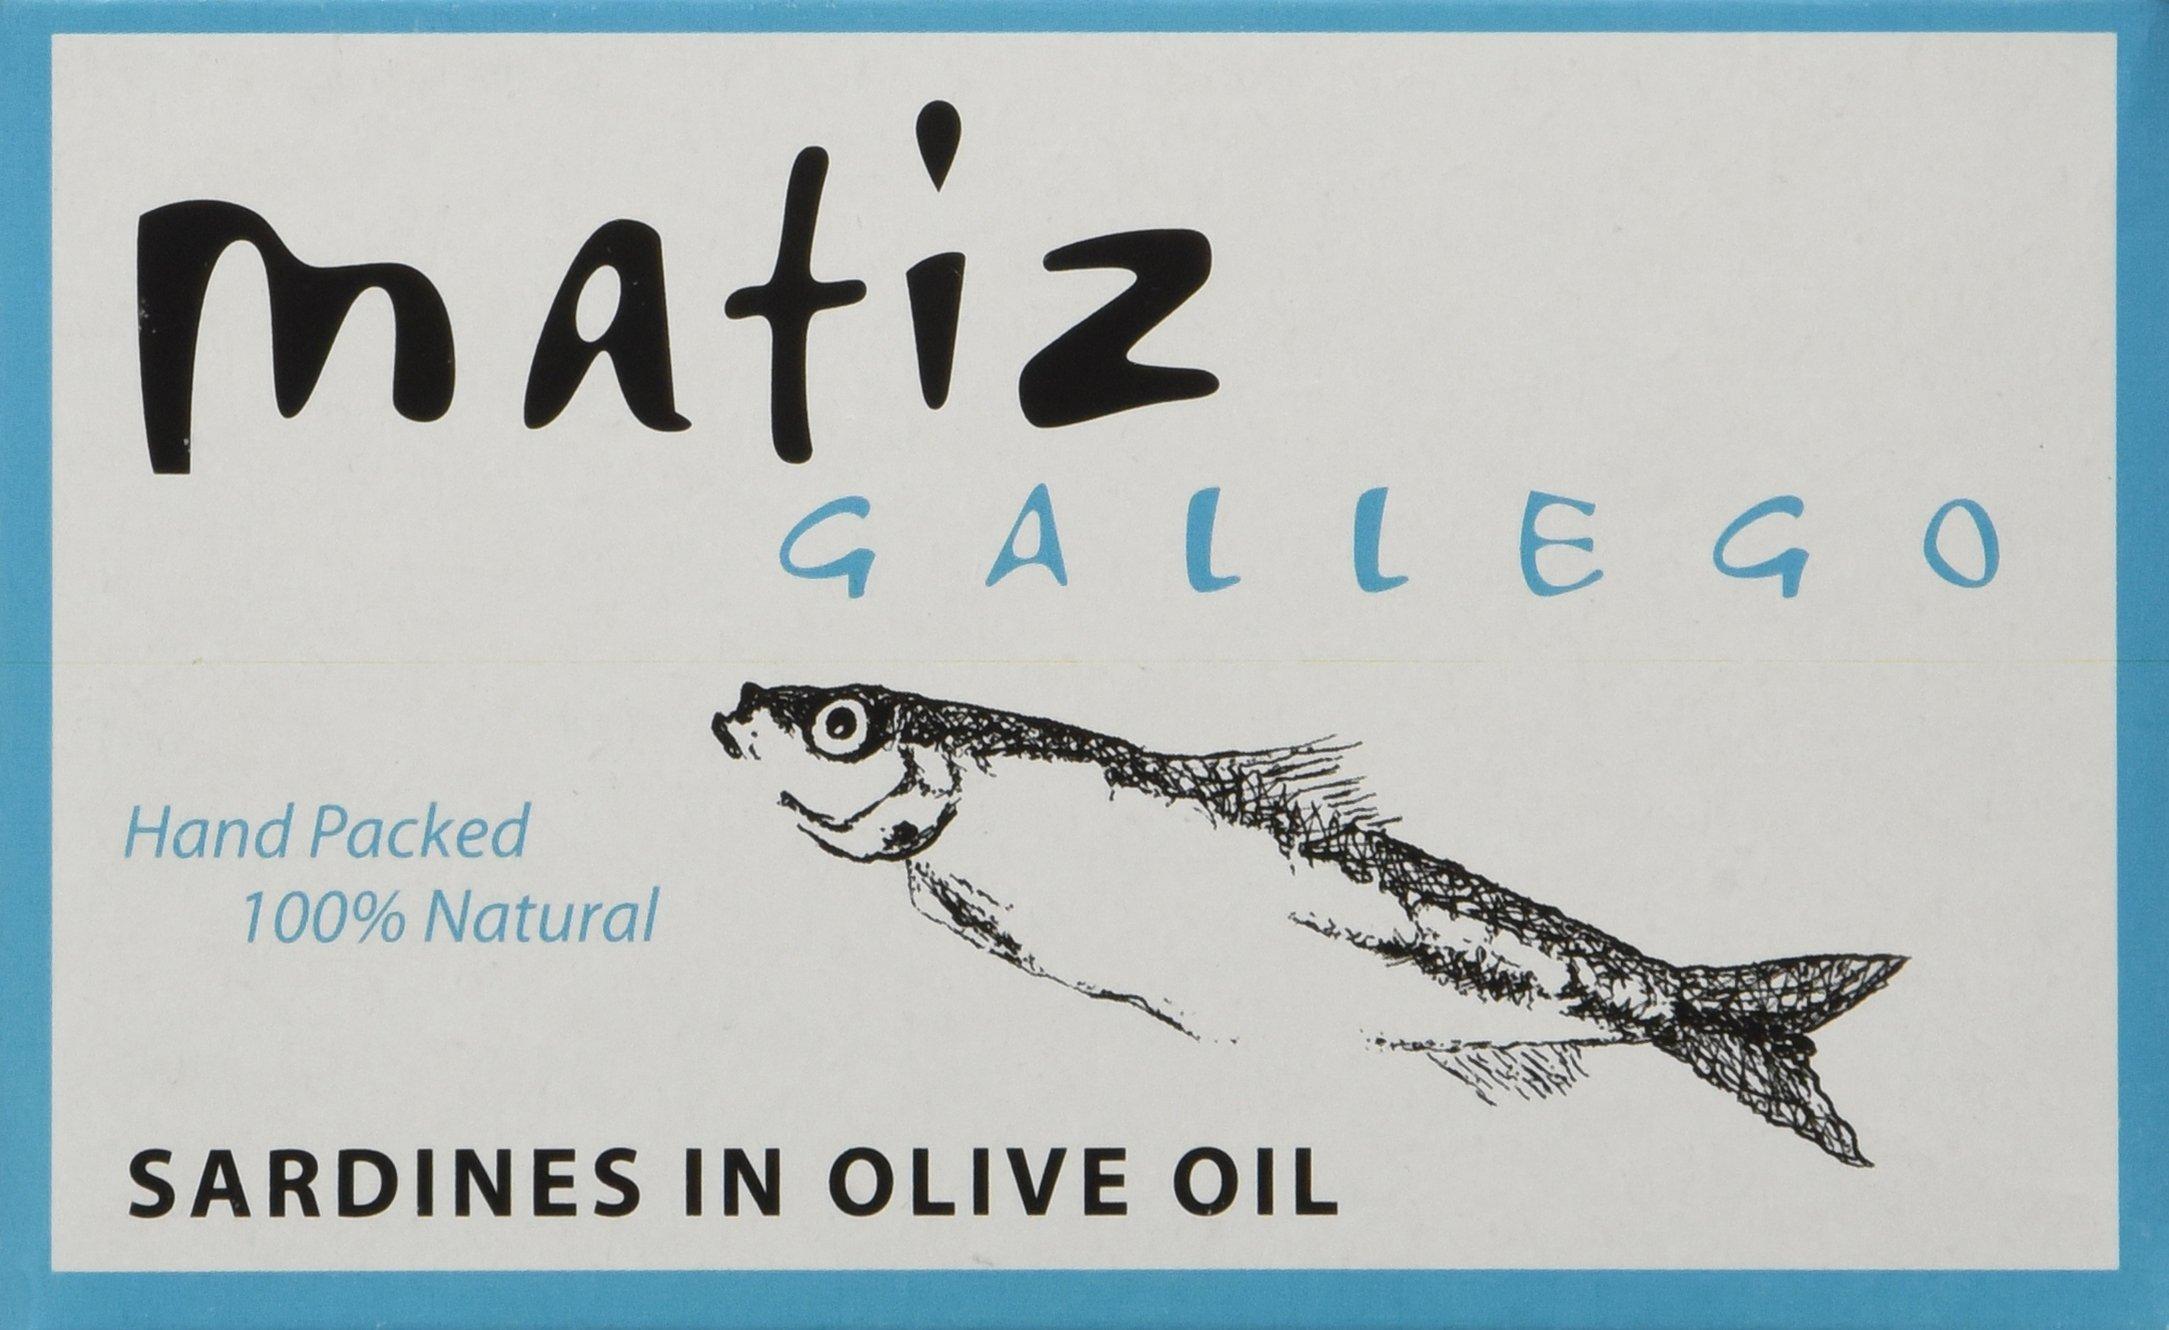 Matiz Gallego Sardines in Olive Oil, 4.2-Ounce Unit